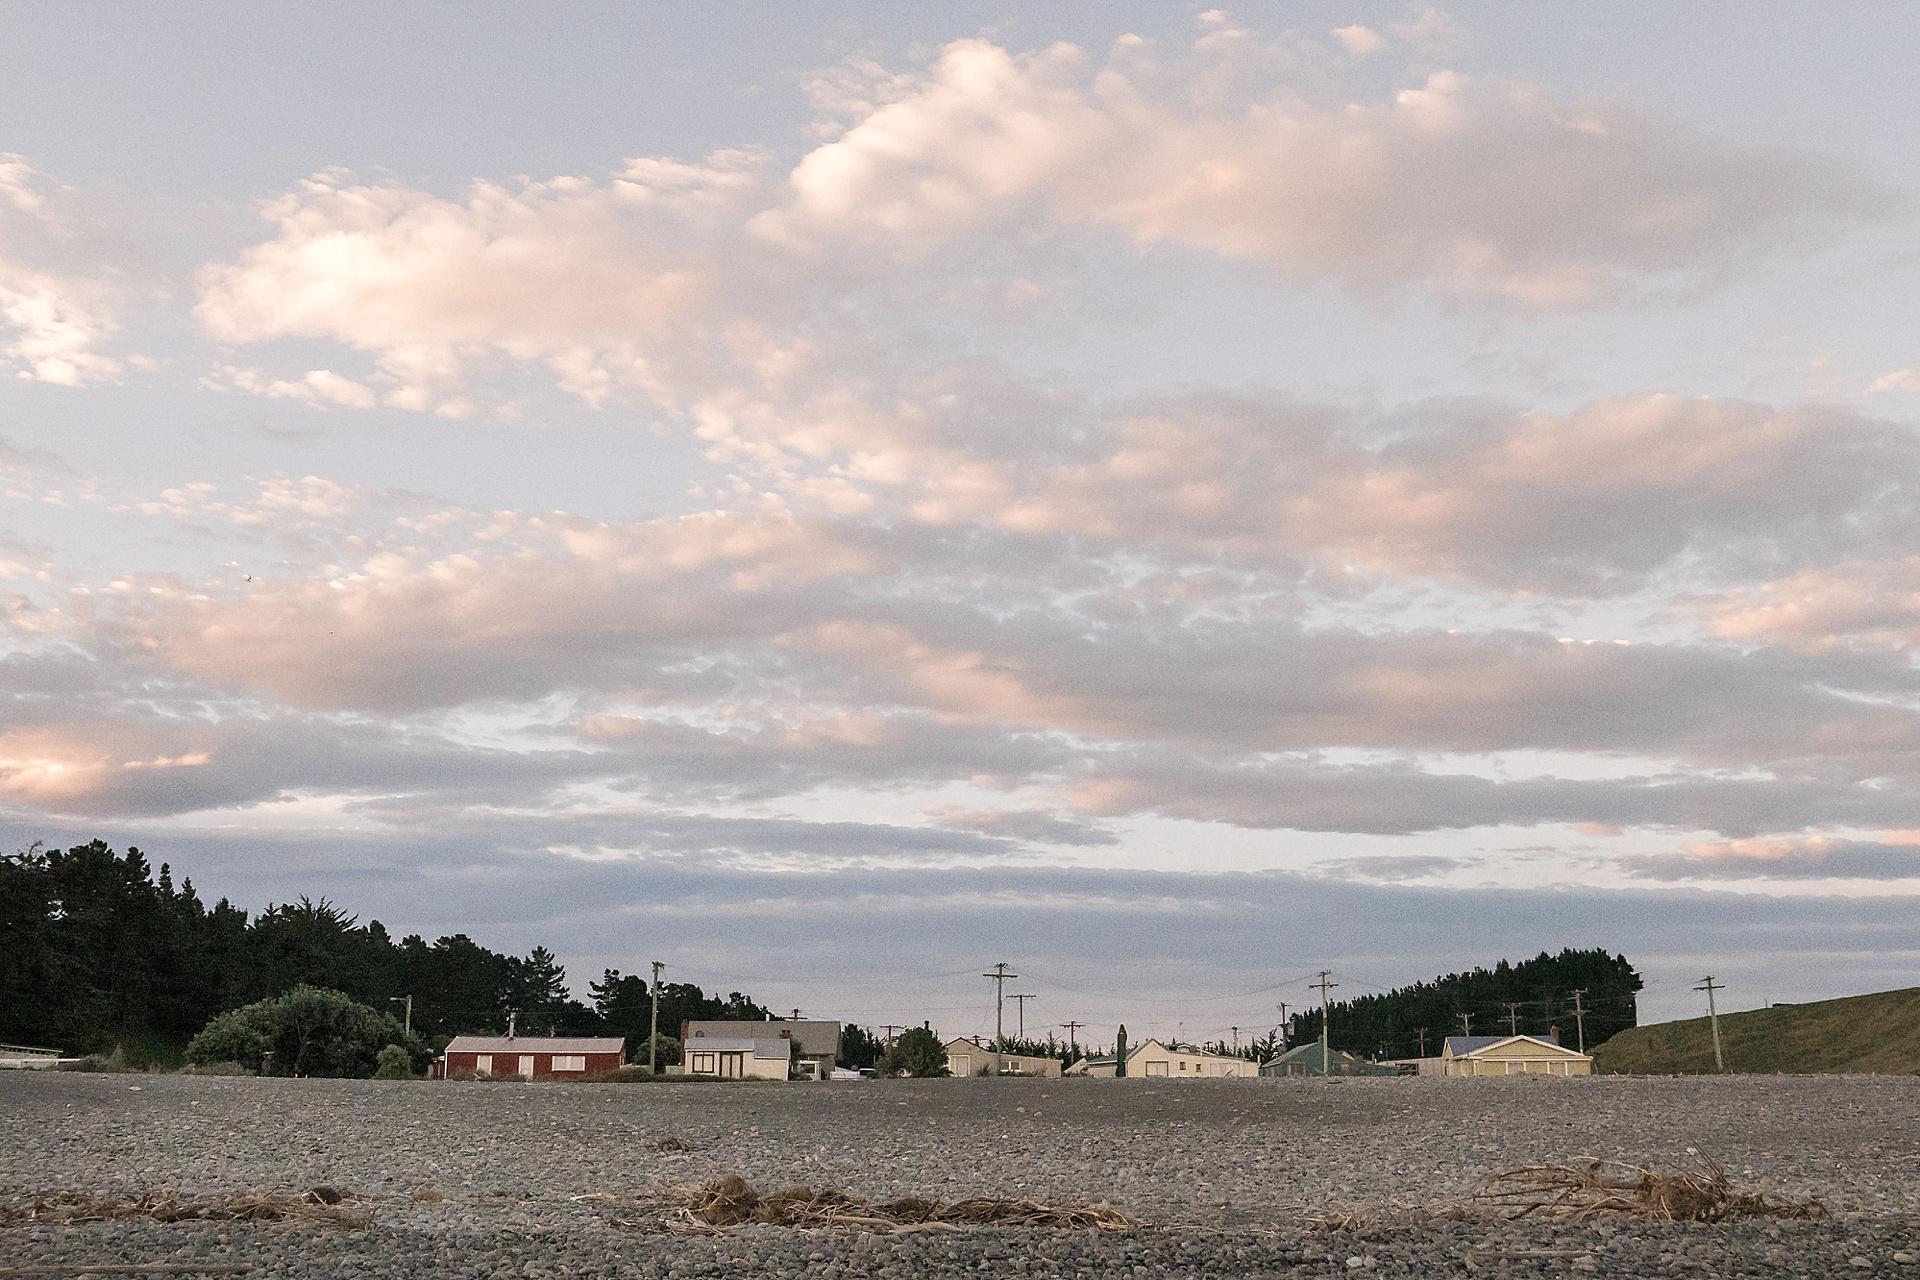 family-roadtrip-neuseeland-travelnewzealand-danielzube_0505.jpg